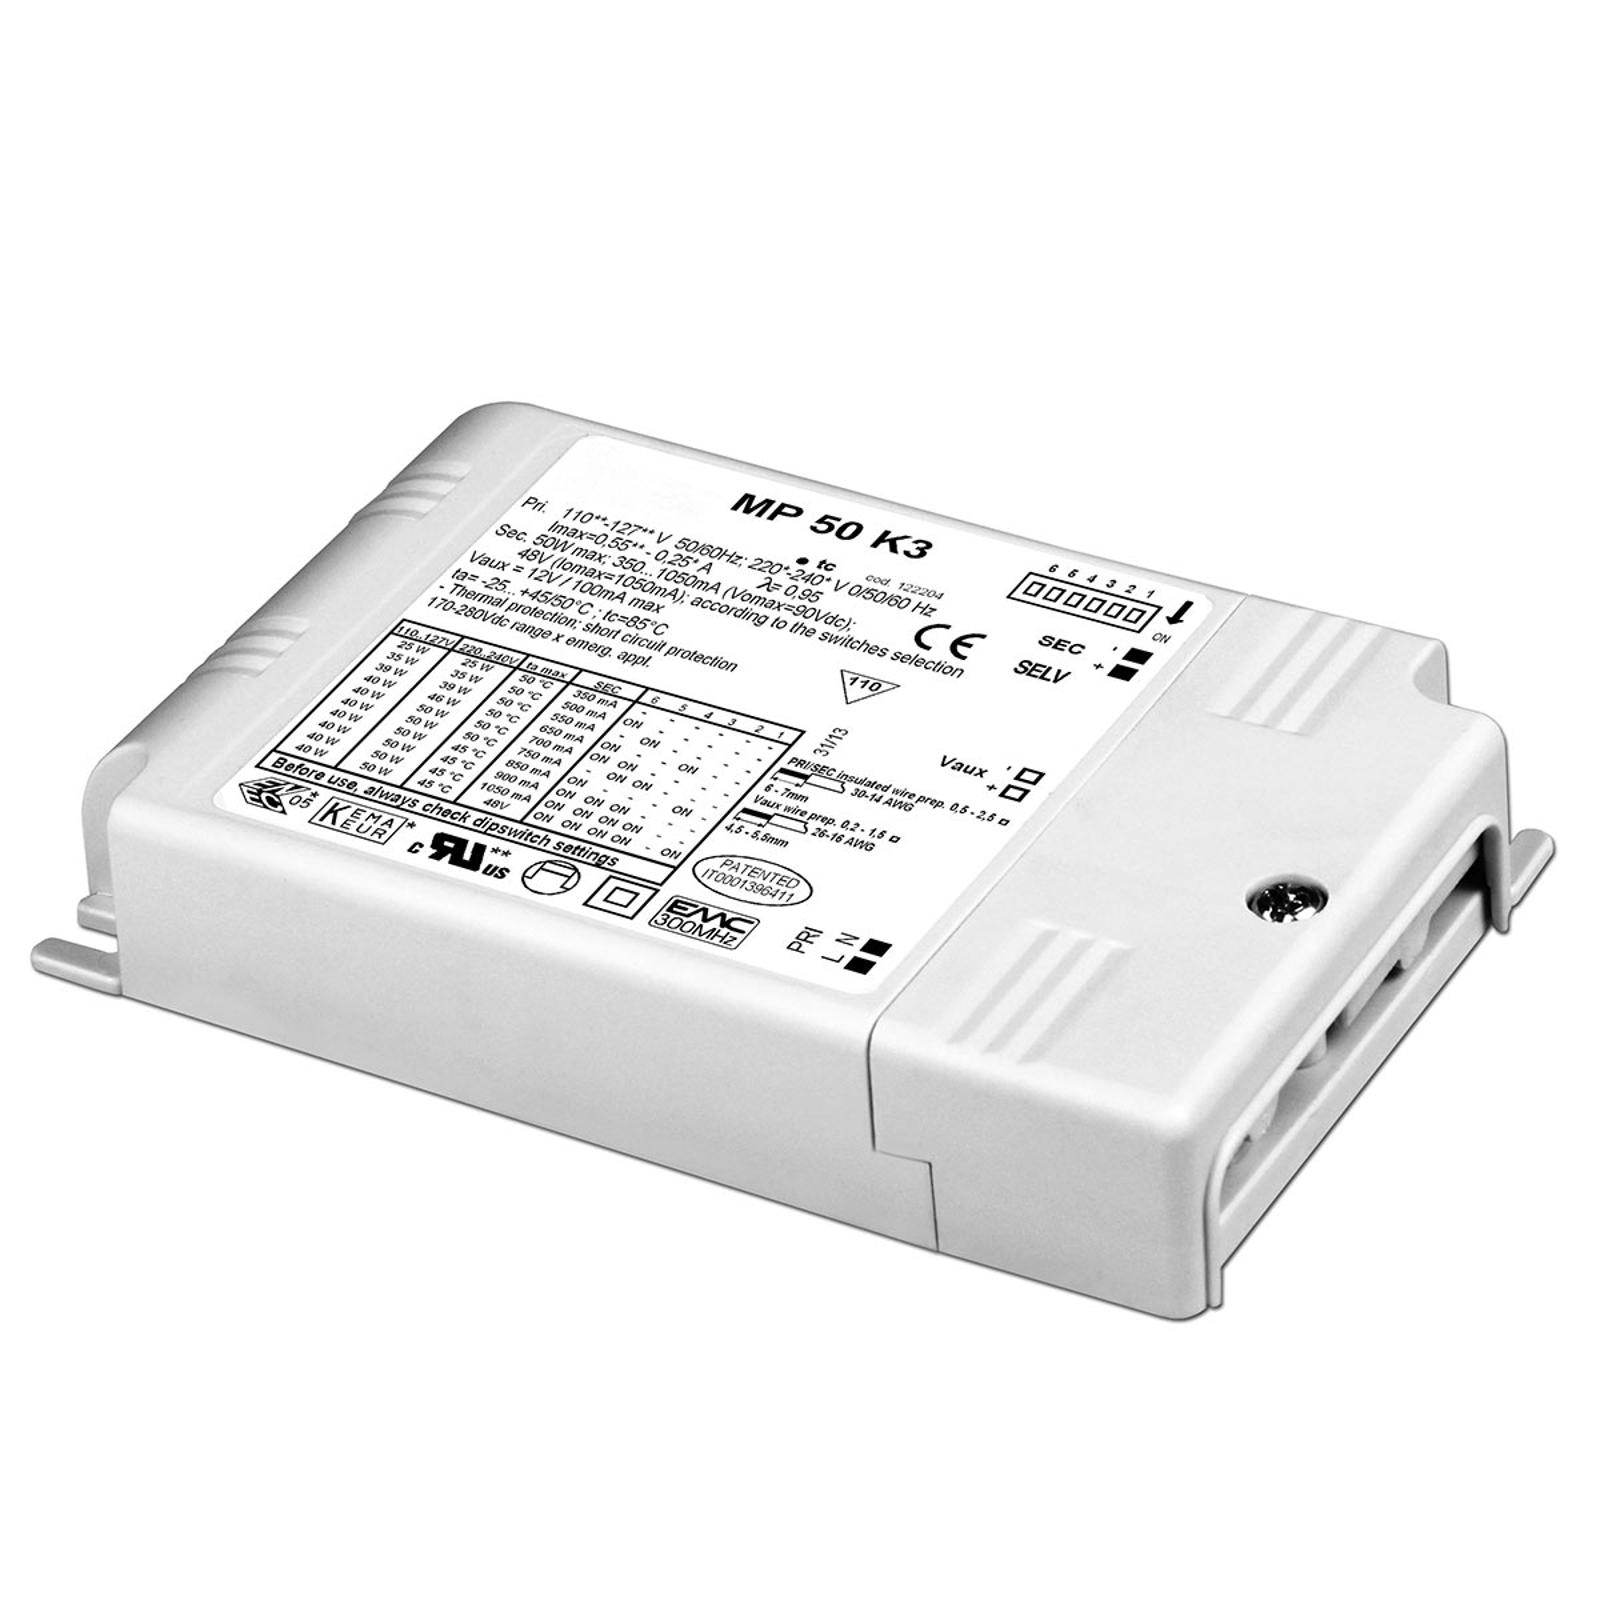 MP 50 K3 LED-konverter, justerbar, ikke dimbar